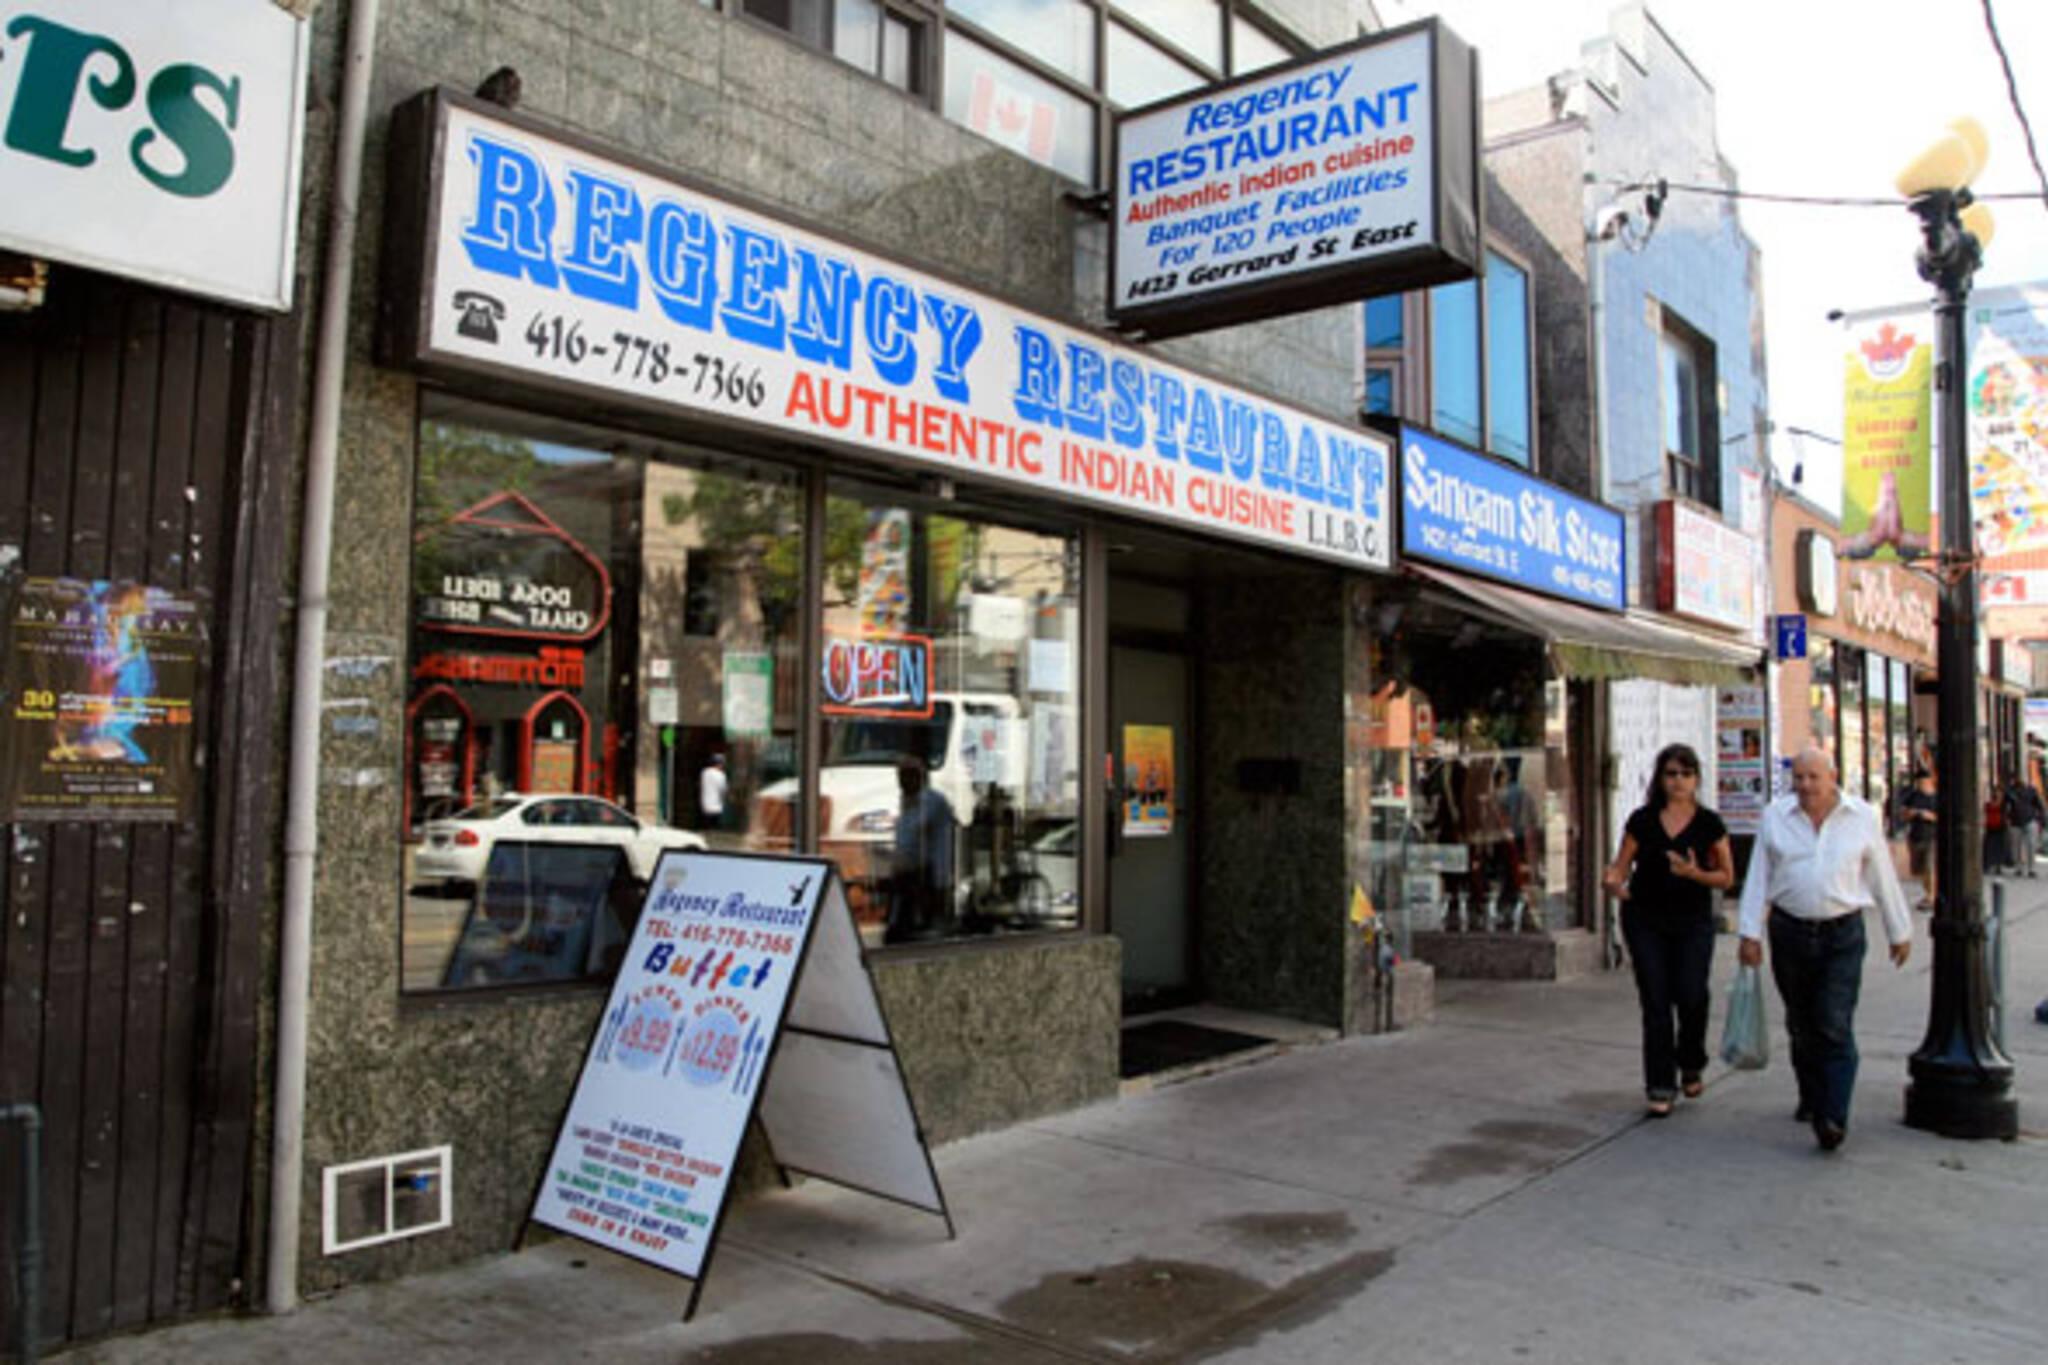 Regency Restaurant Toronto